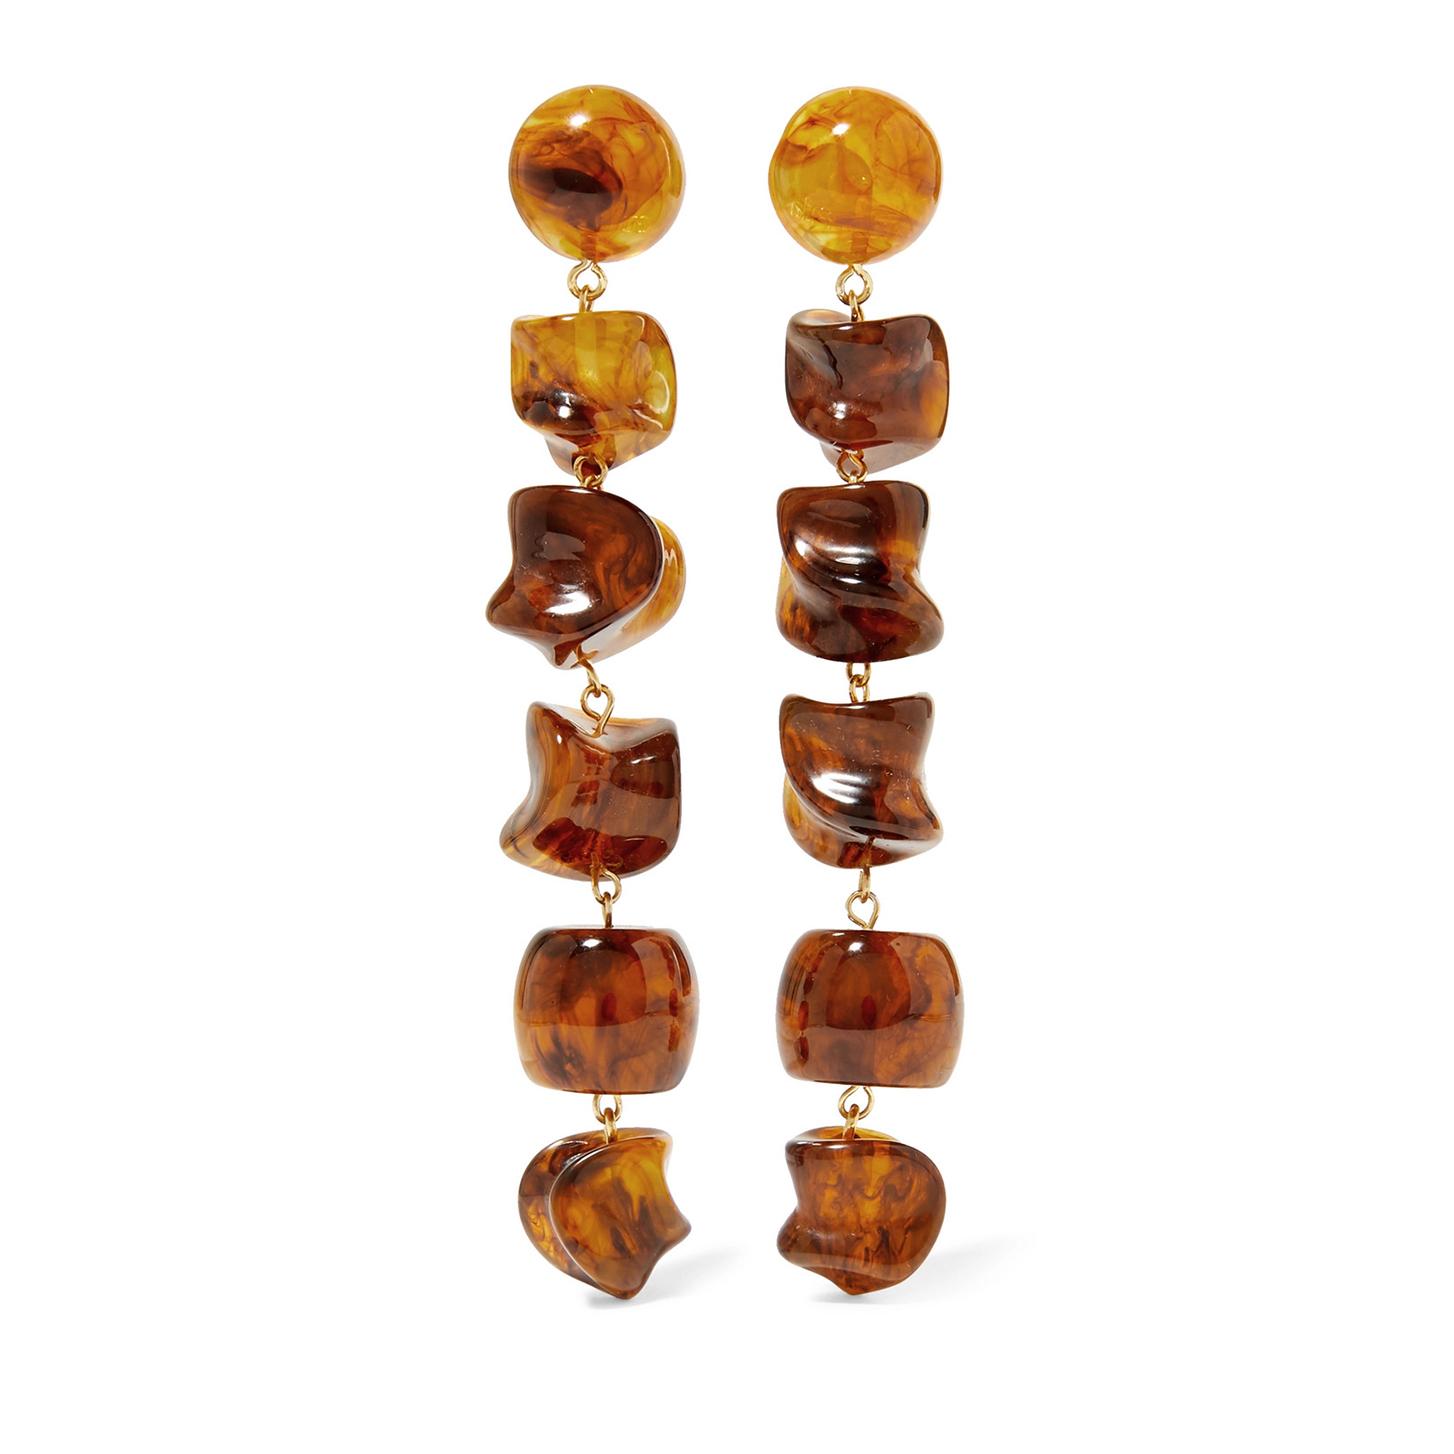 Cult Gaia Leo Gold-tone Resin Earrings